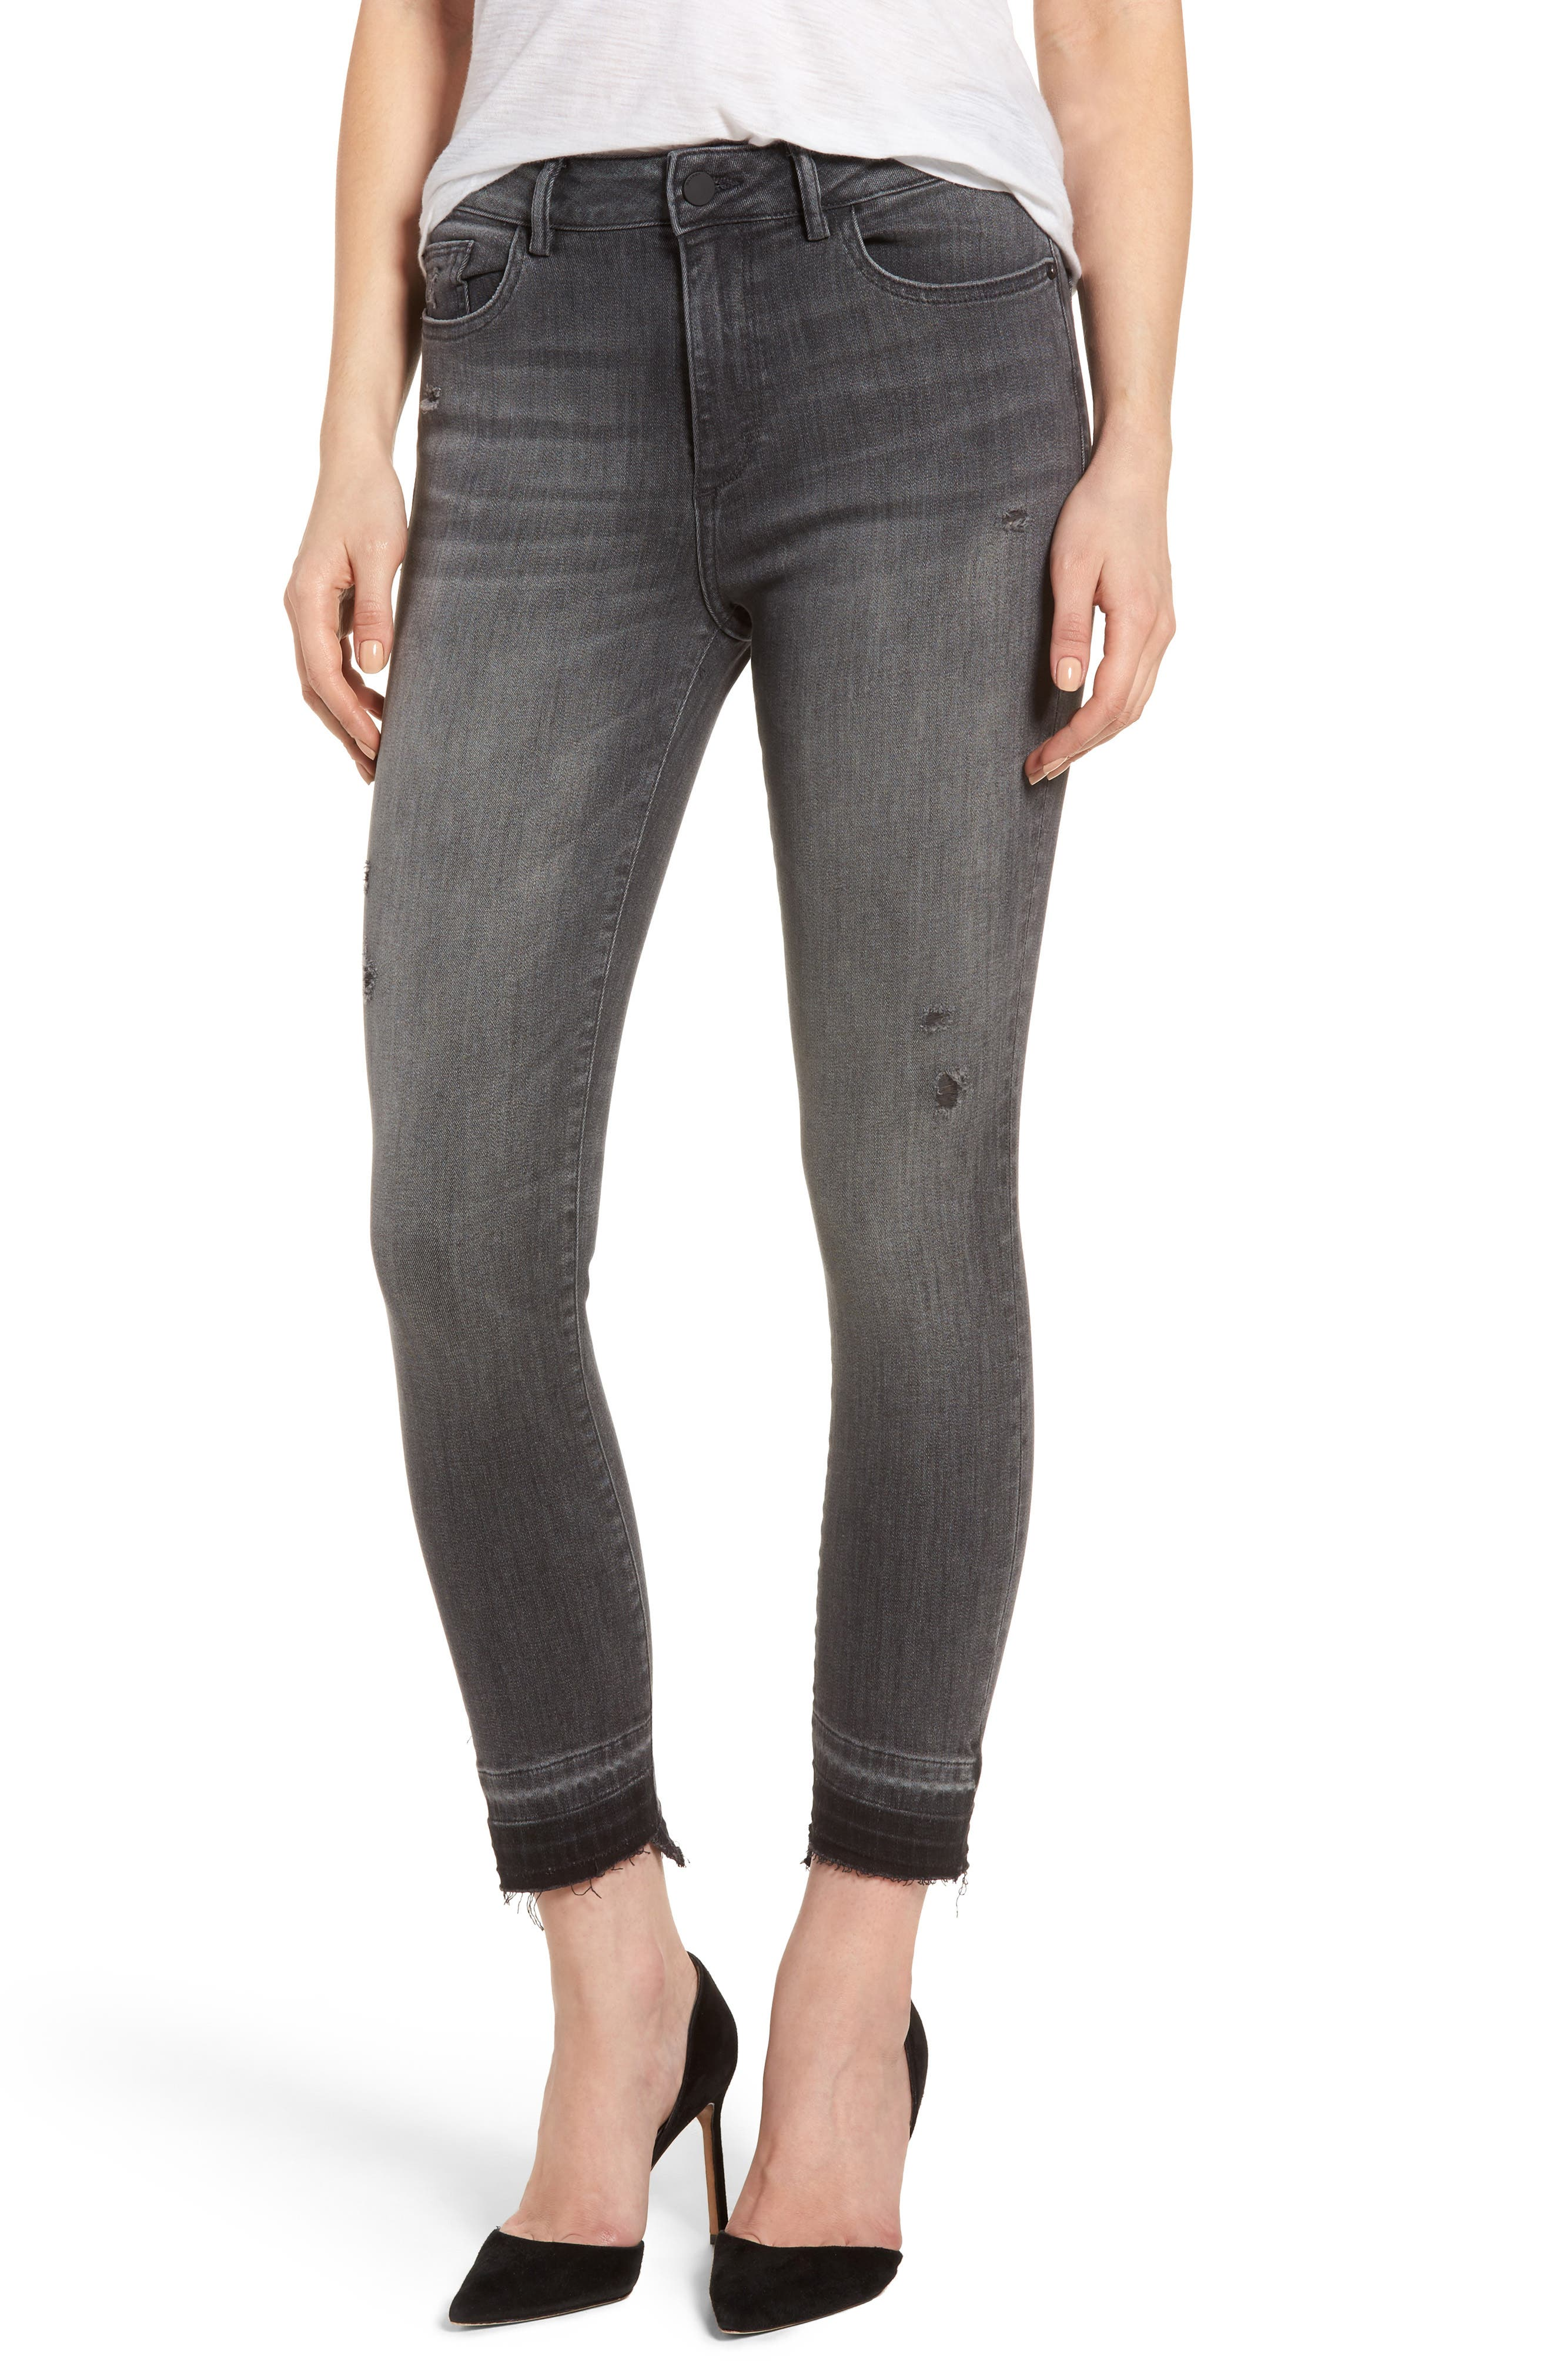 Farrow High Waist Instaslim Skinny Jeans,                             Main thumbnail 1, color,                             020